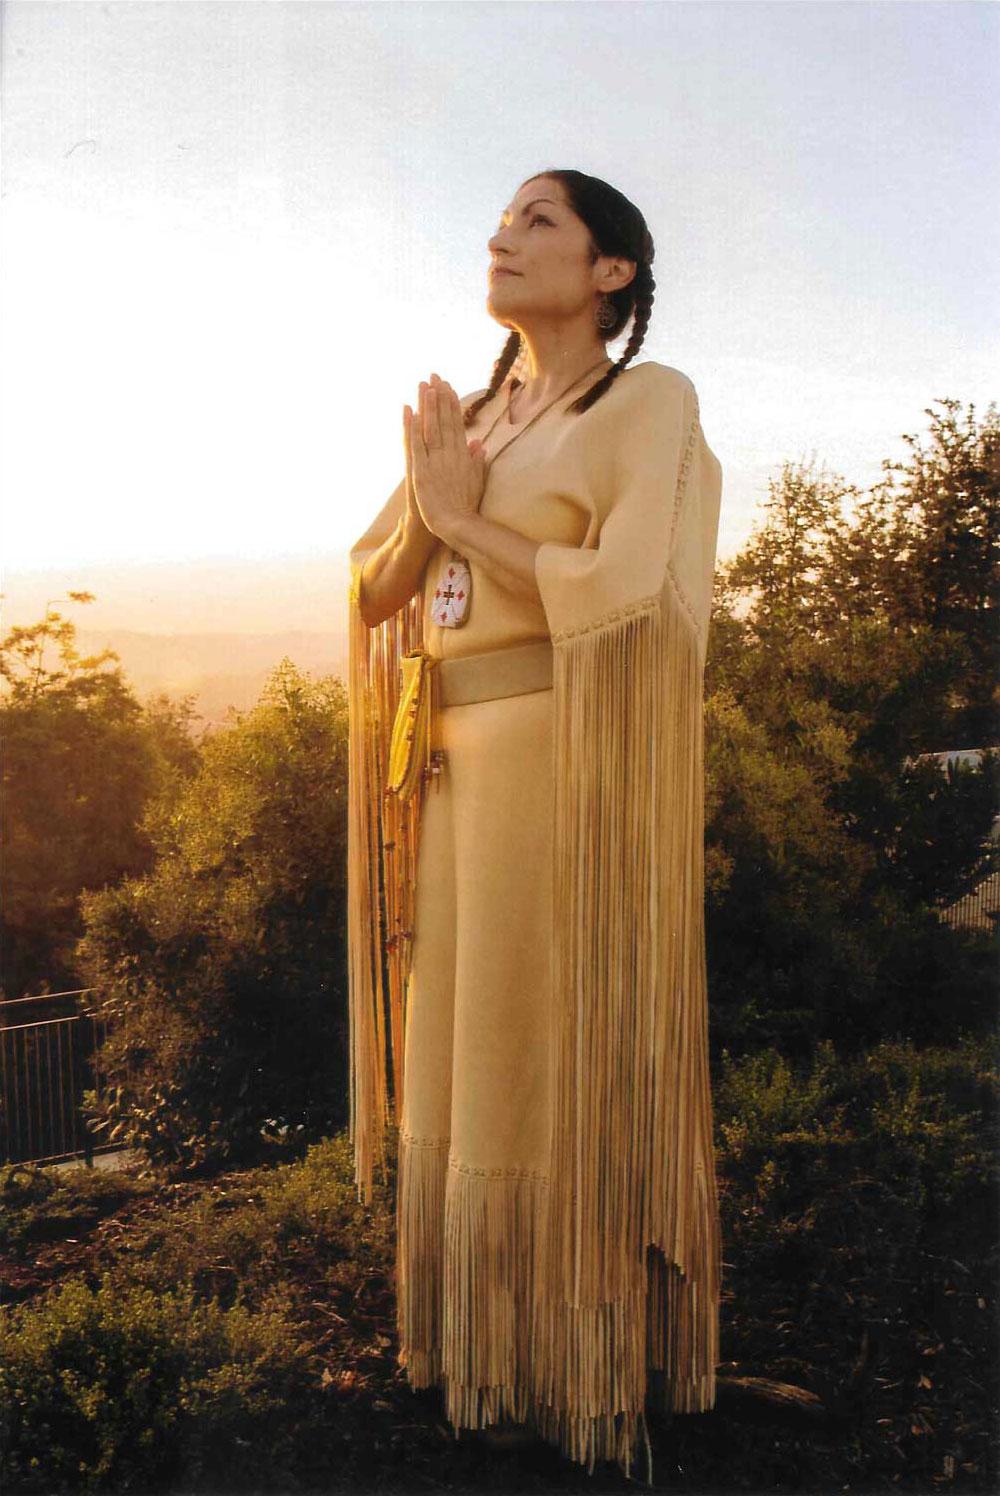 Monica Ortiz in Native American regalia